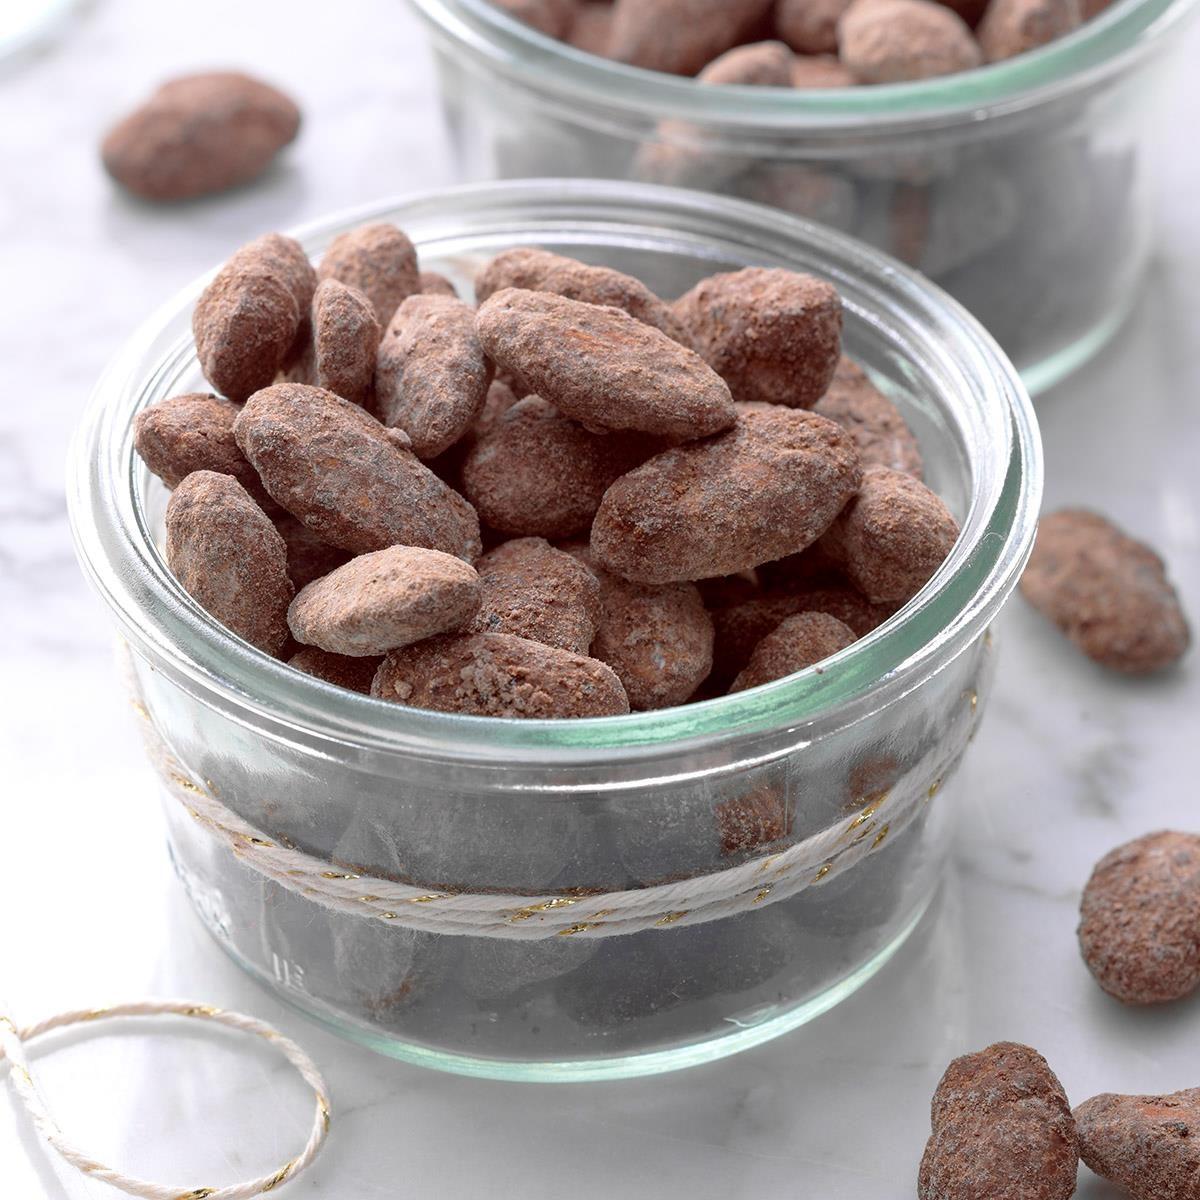 Chocolate Mocha Dusted Almonds